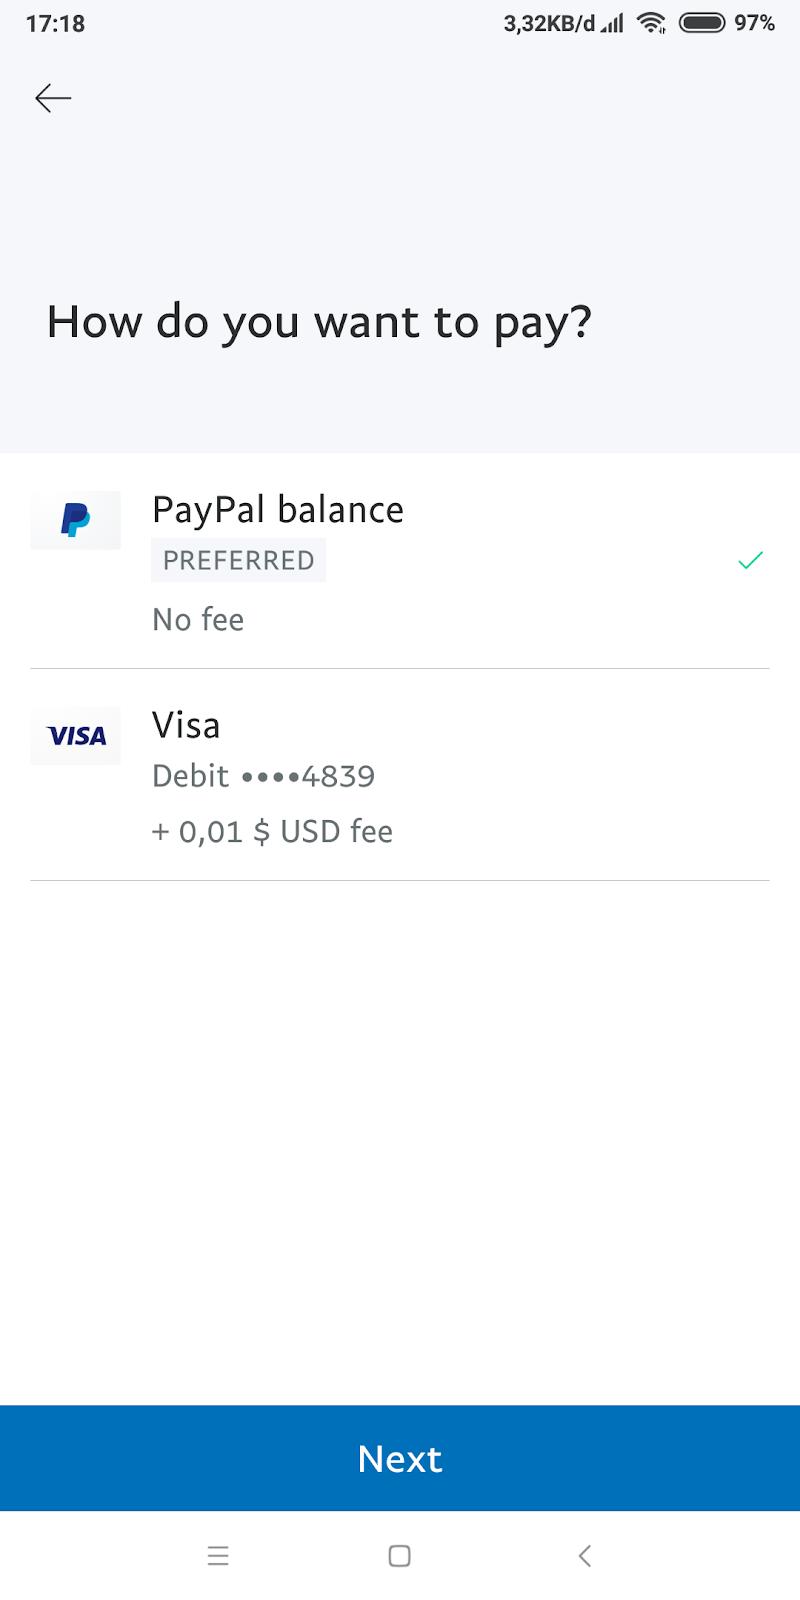 Cara ngirim pembayaran paypal no fee